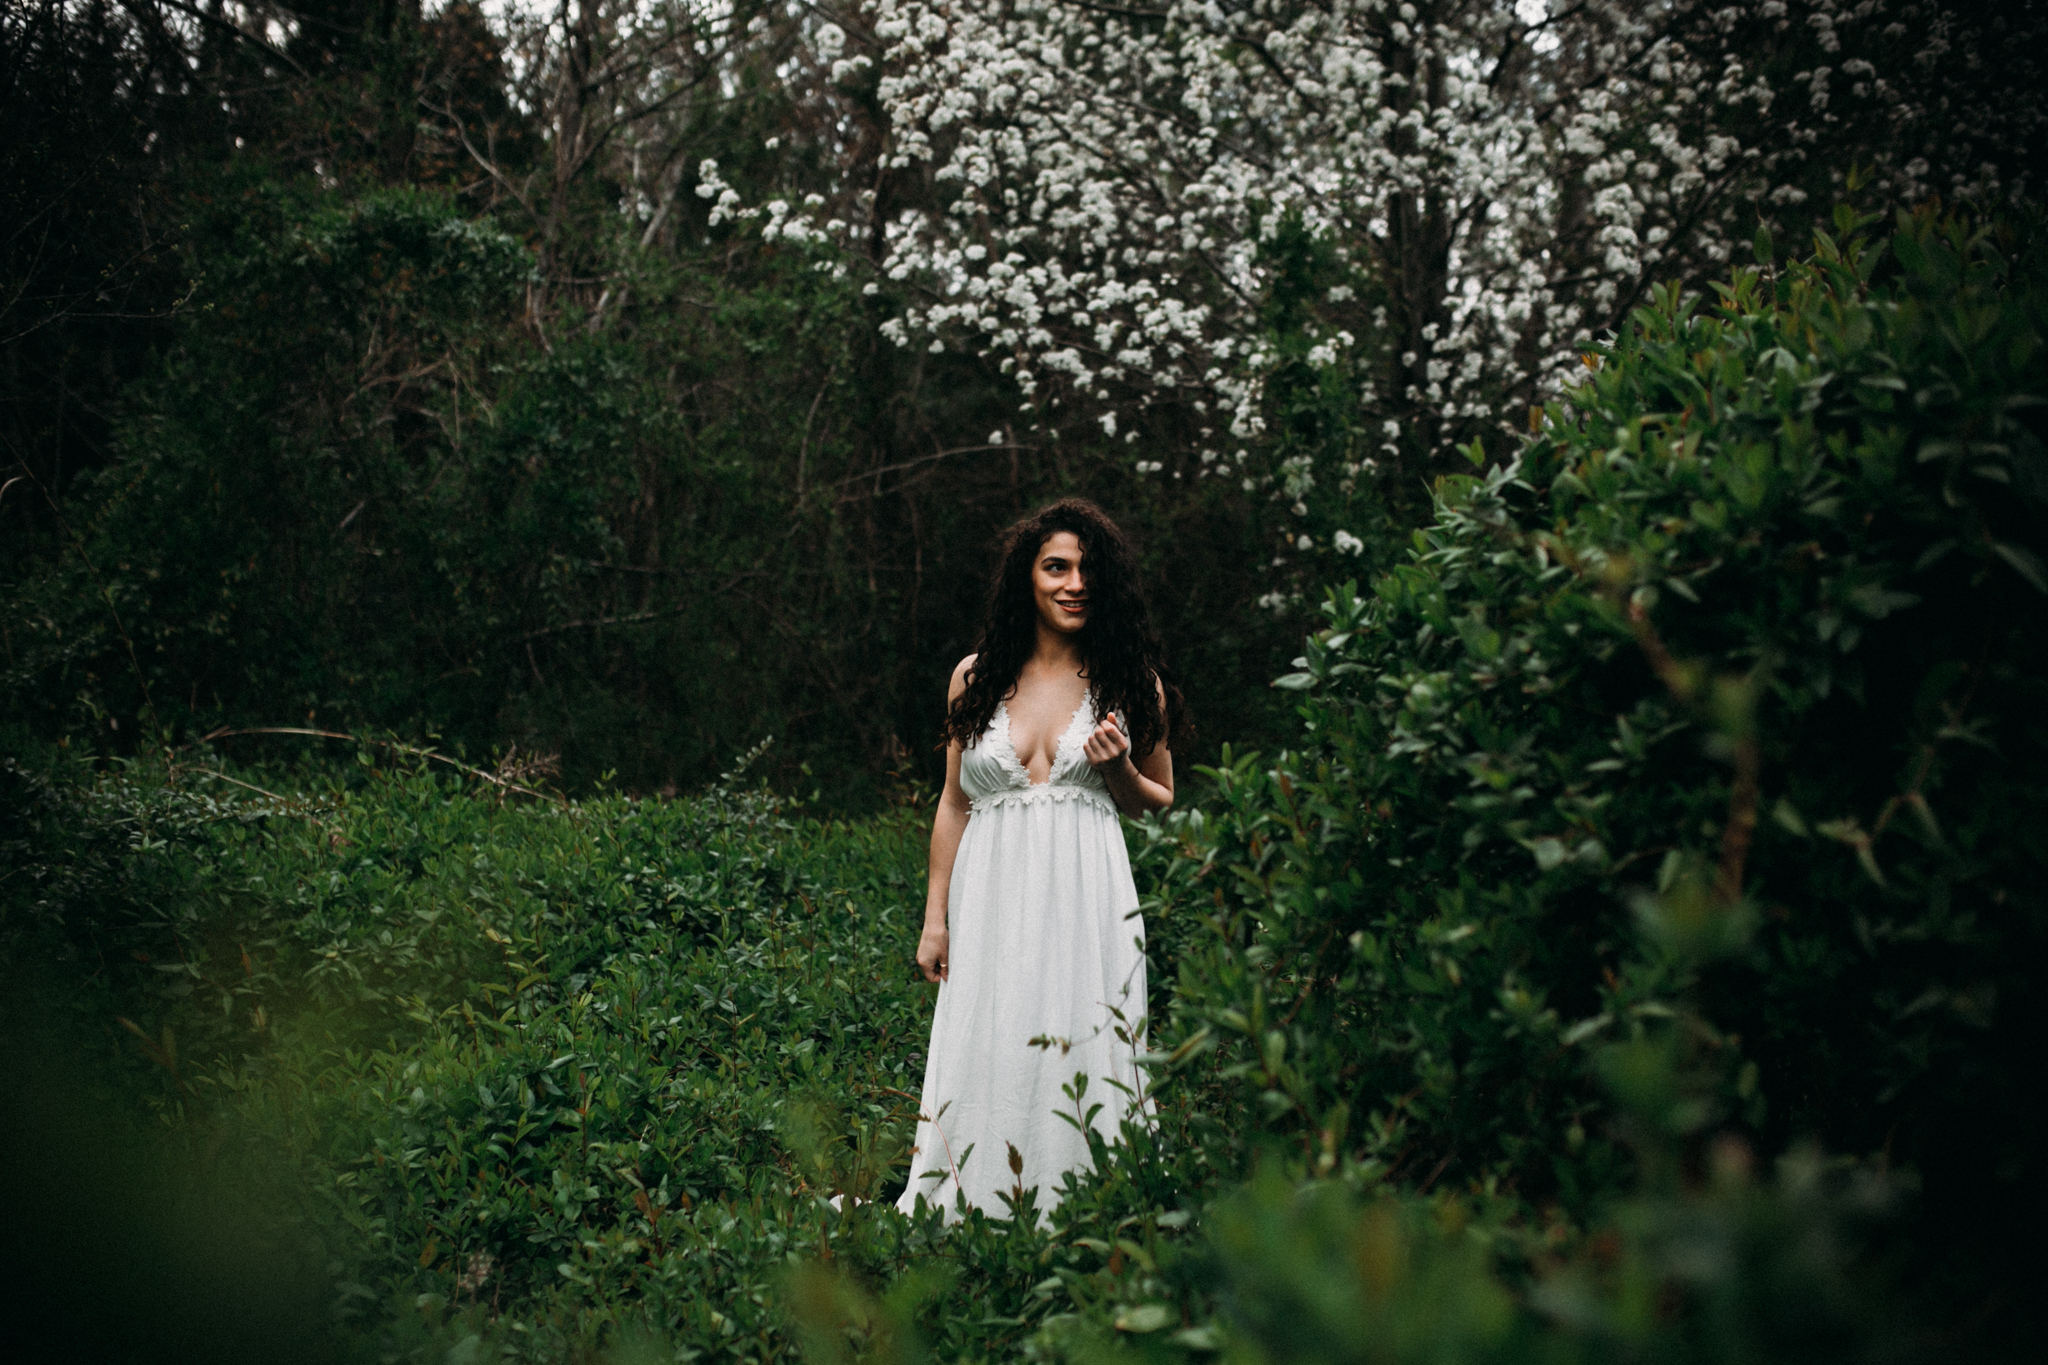 Jessica.VirginiaBeach.Virginia.Boudoir.emotivestorytelling-9.JPG